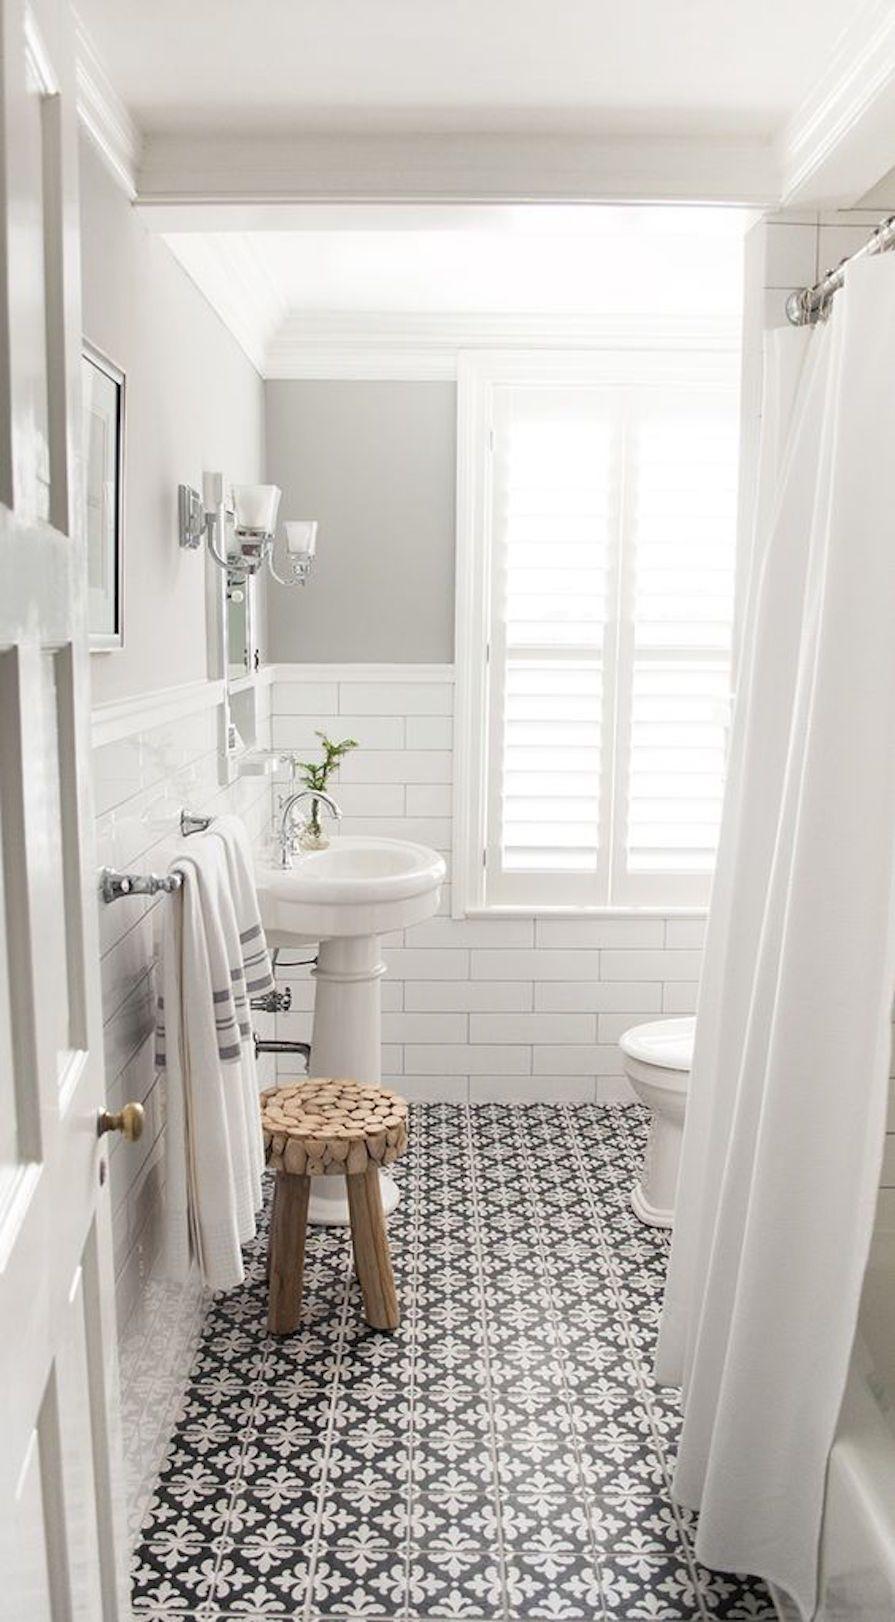 Ladrilhos no banheiro retro bathrooms bath and tile ideas ladrilhos no banheiro patterned tile bathroom floorpaint bathroom tilesvintage dailygadgetfo Choice Image